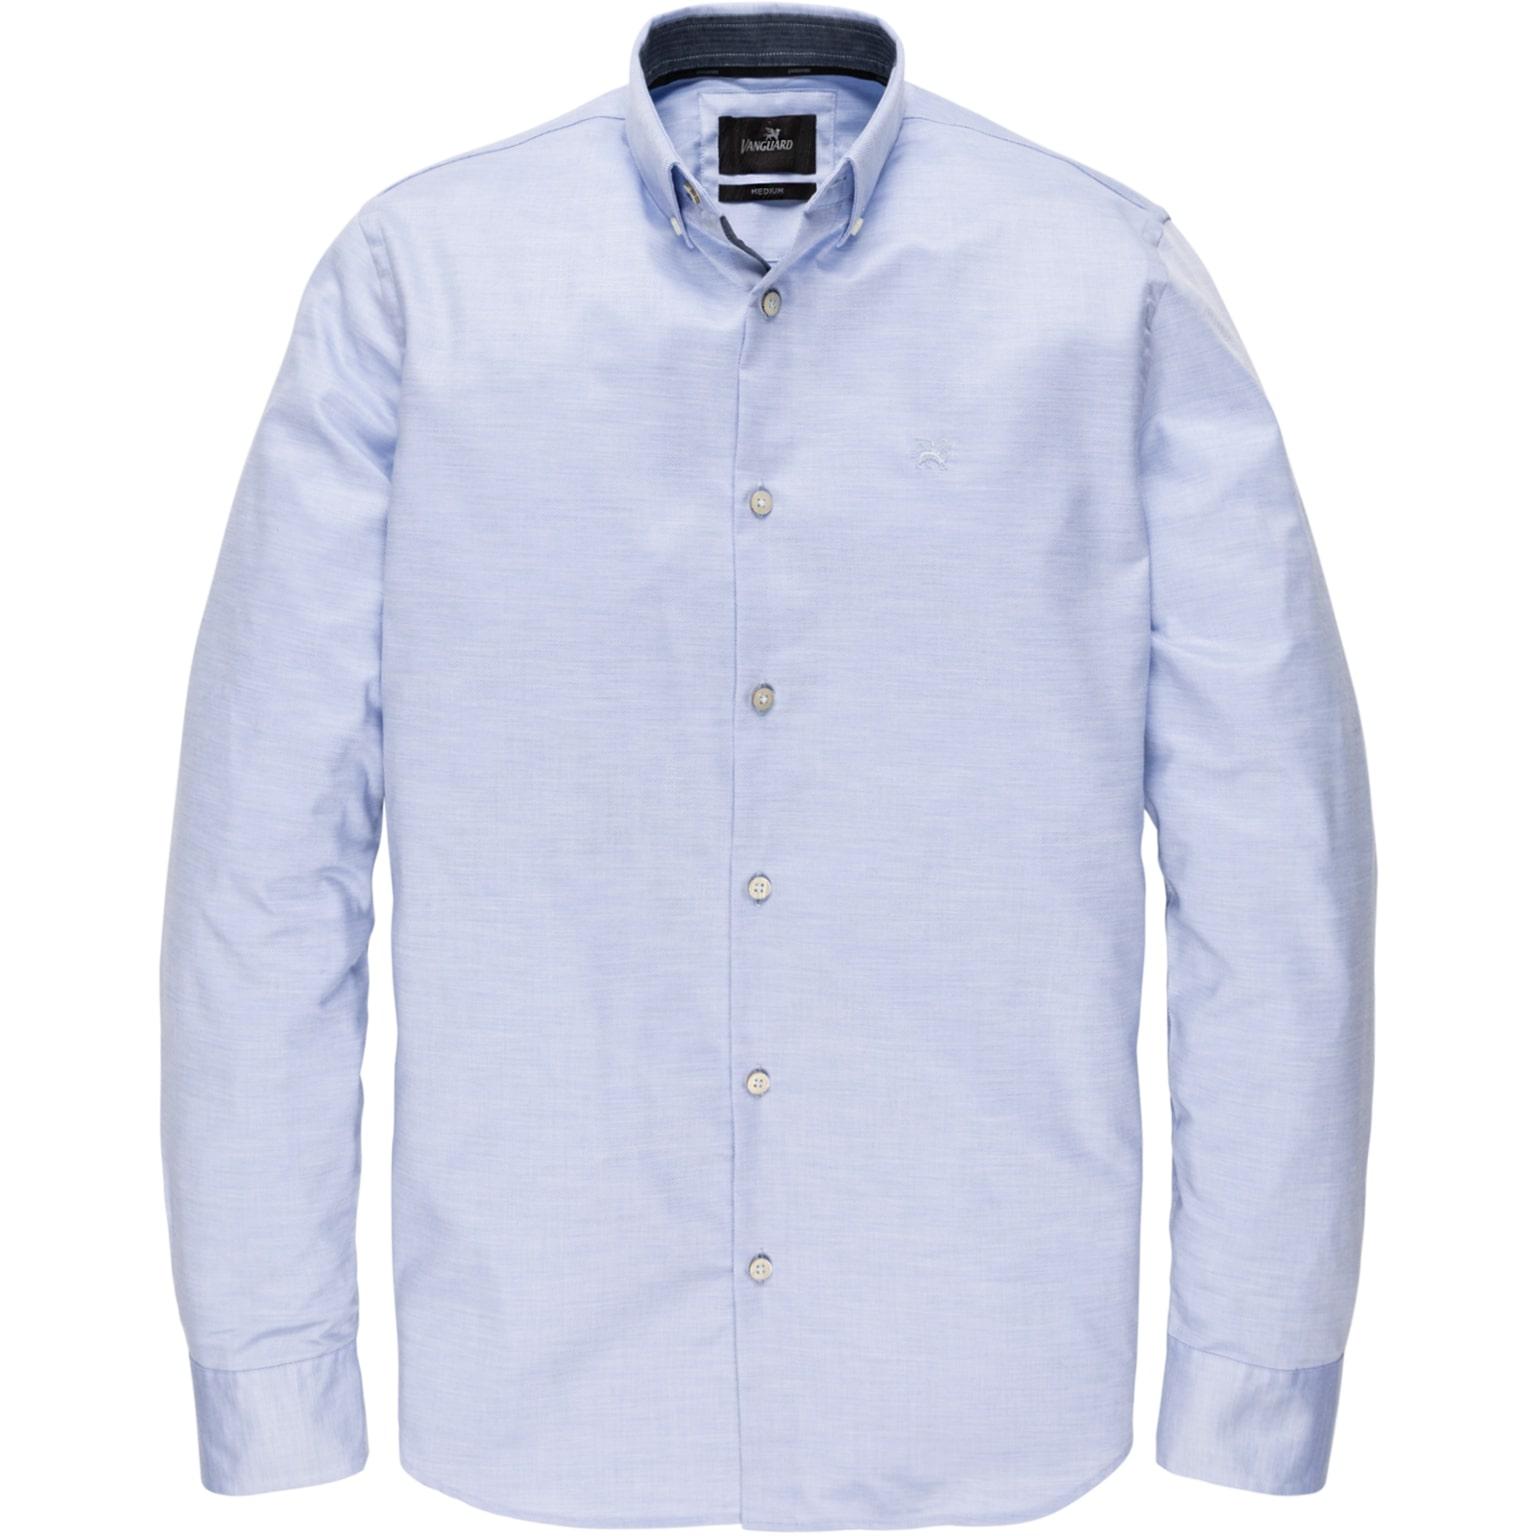 Lichtblauw heren overhemd Vanguard - VSI202220 5296